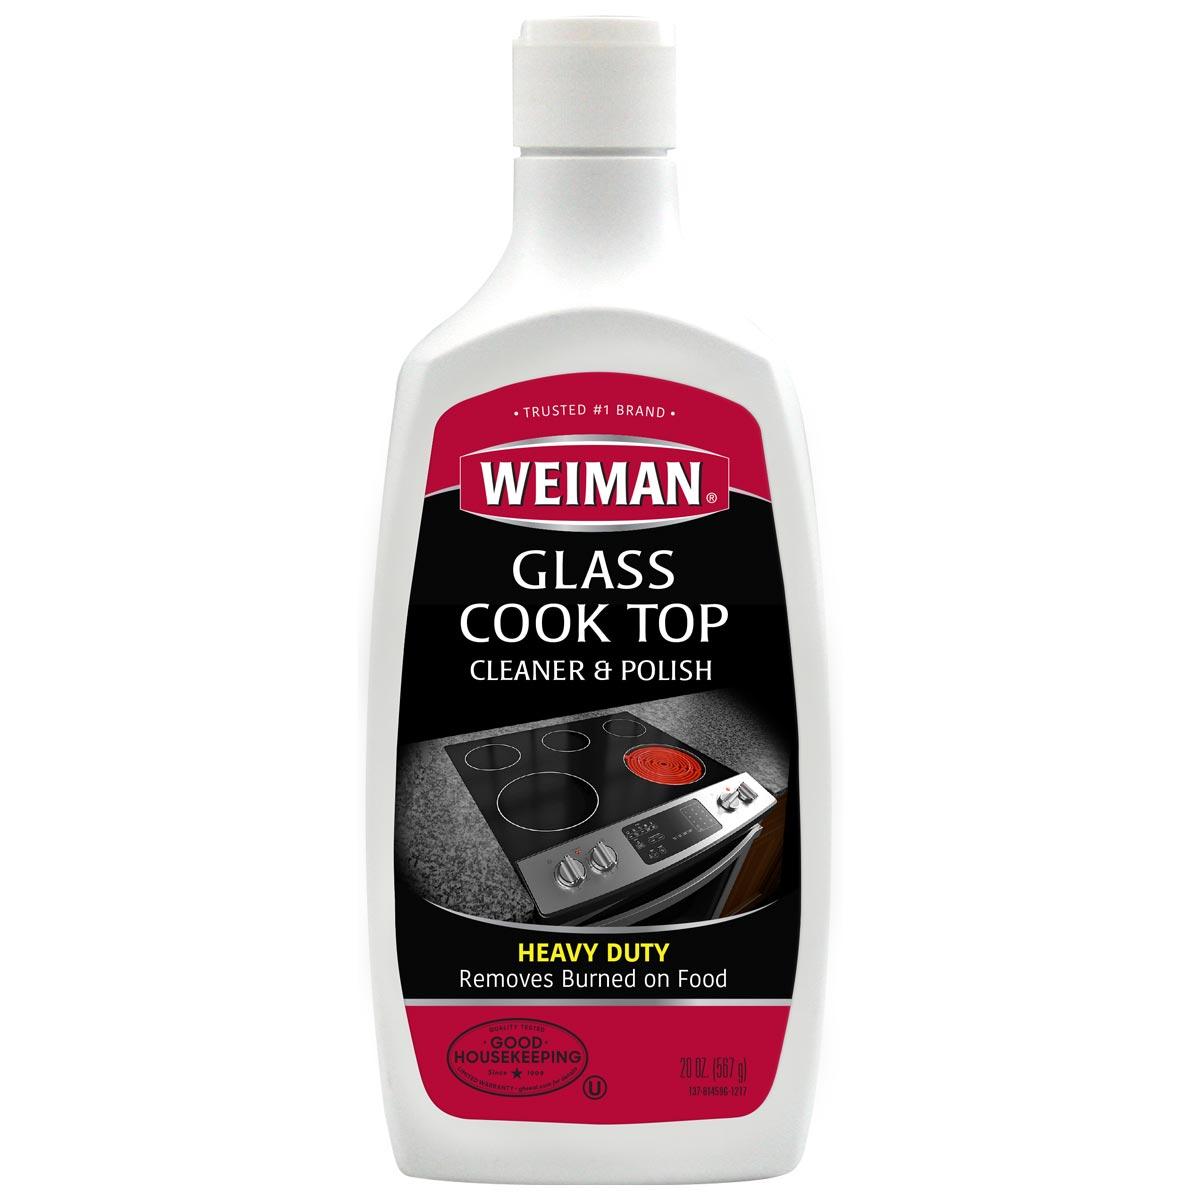 https://googone.com/media/catalog/product/w/e/weiman-cooktop-cleaner-heavy-duty_front.jpg